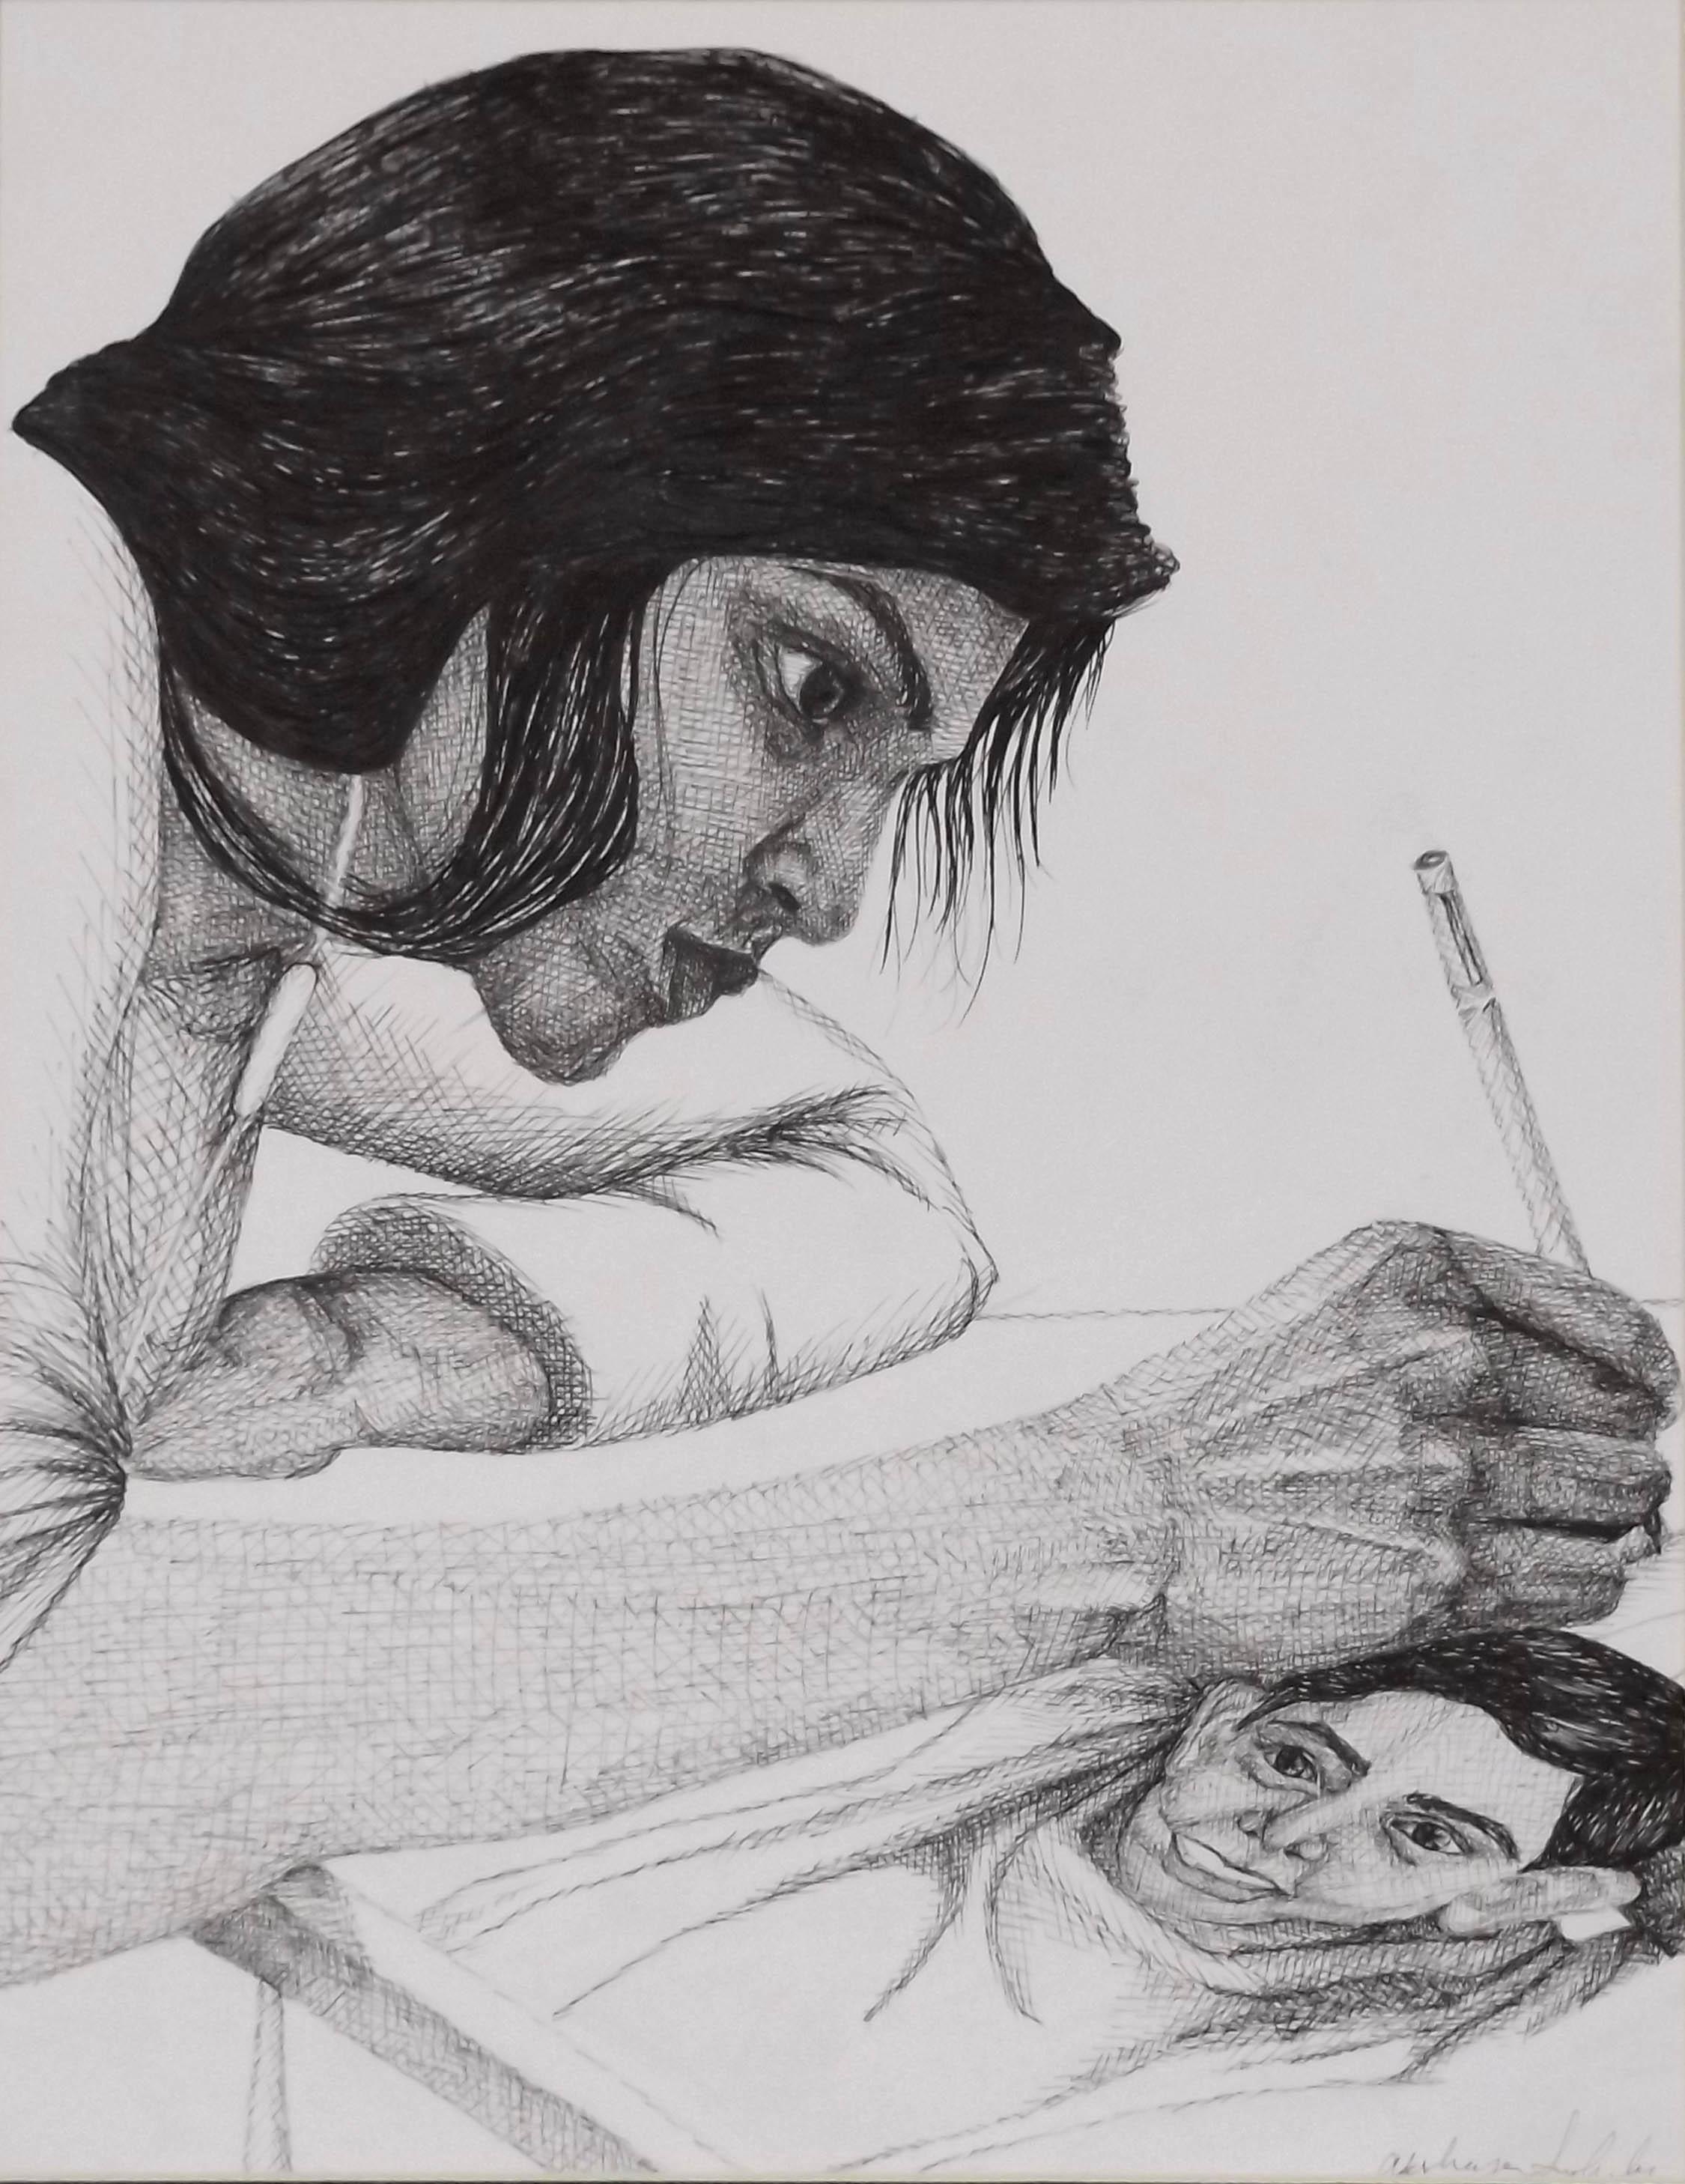 Akshaya S. – Micron Pen